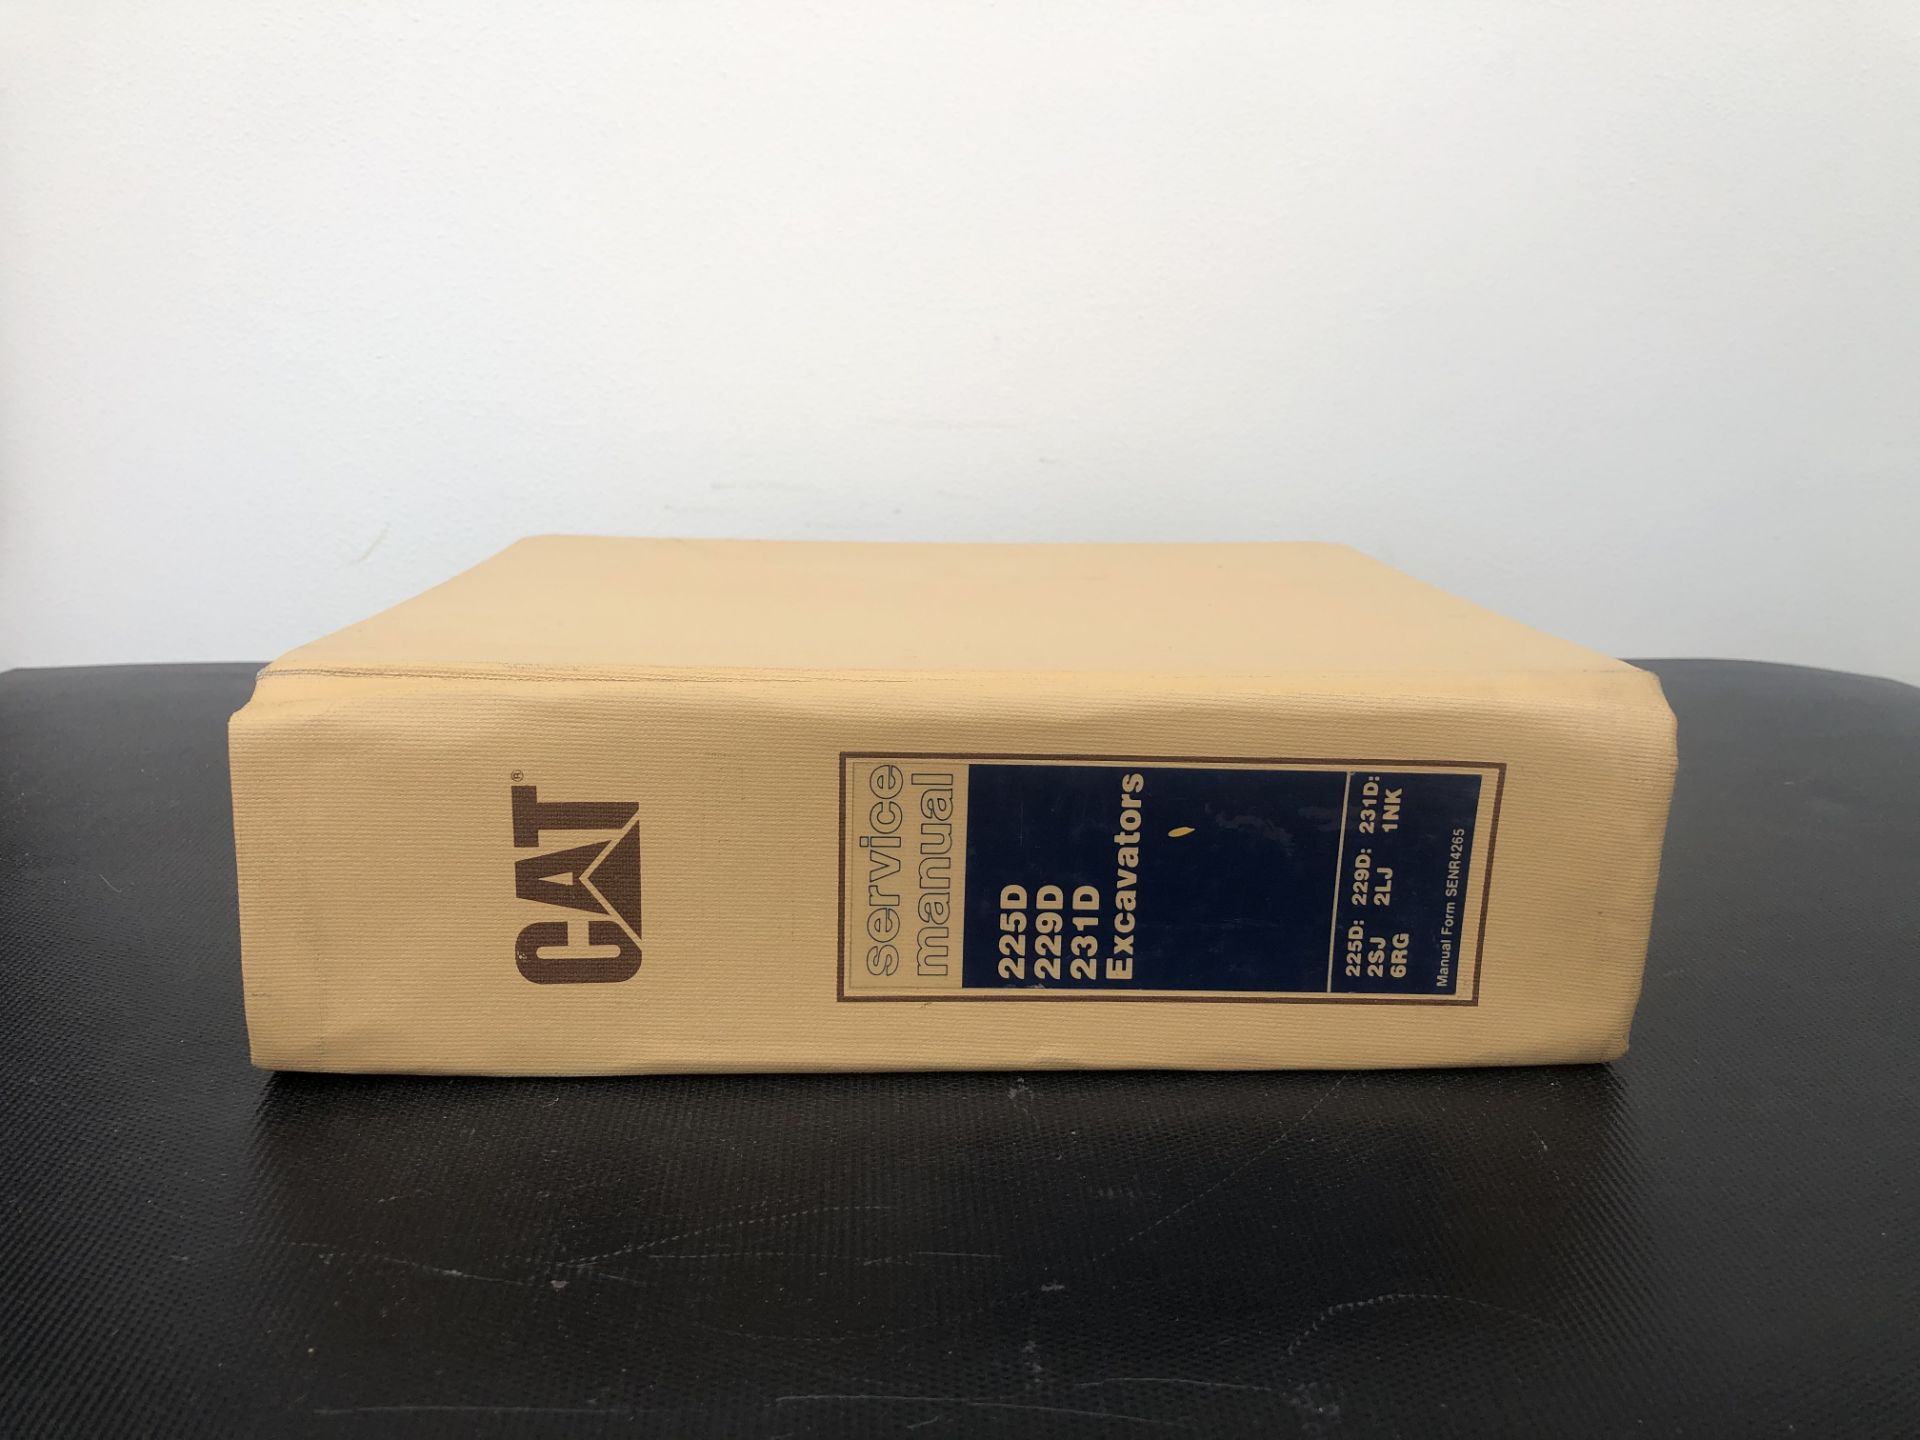 CATERPILLAR 225D 229D 231D BOOK 2 SERVICE MANUAL, GENUINE FACTORY CAT WORKSHOP MANUAL